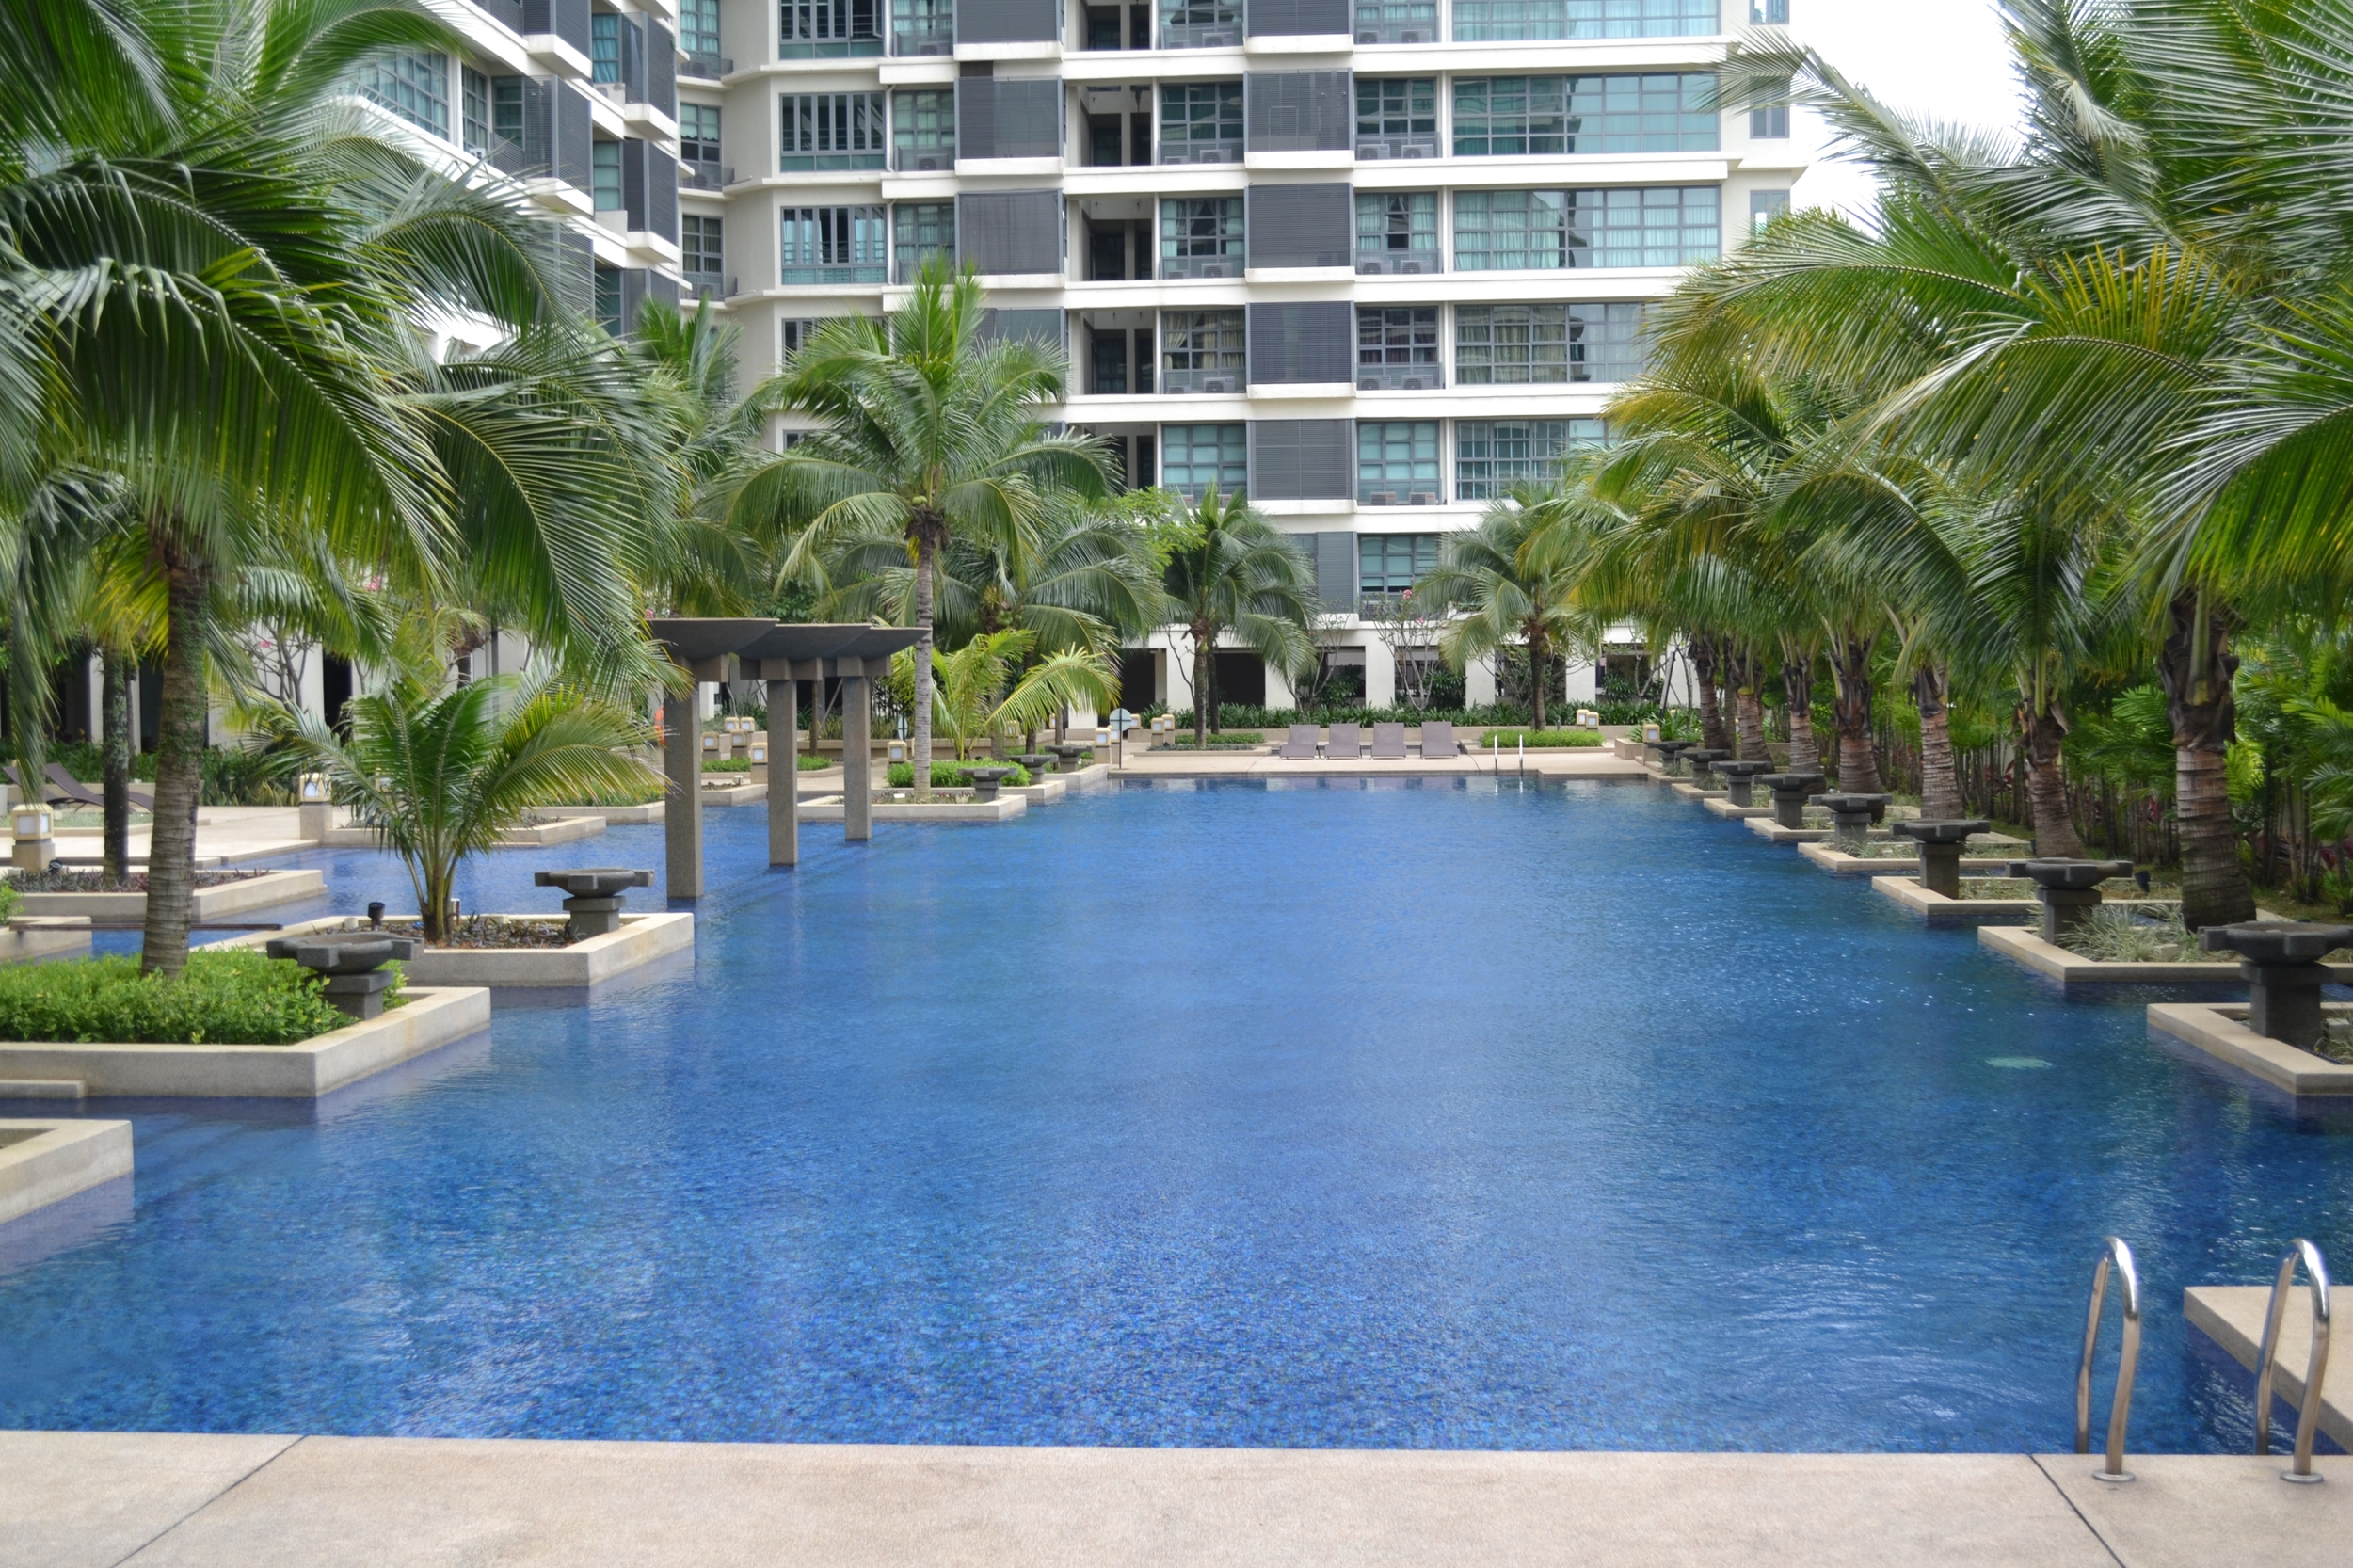 Saujana Residency Condominium, Subang Jaya   Code Used: SQ-244S